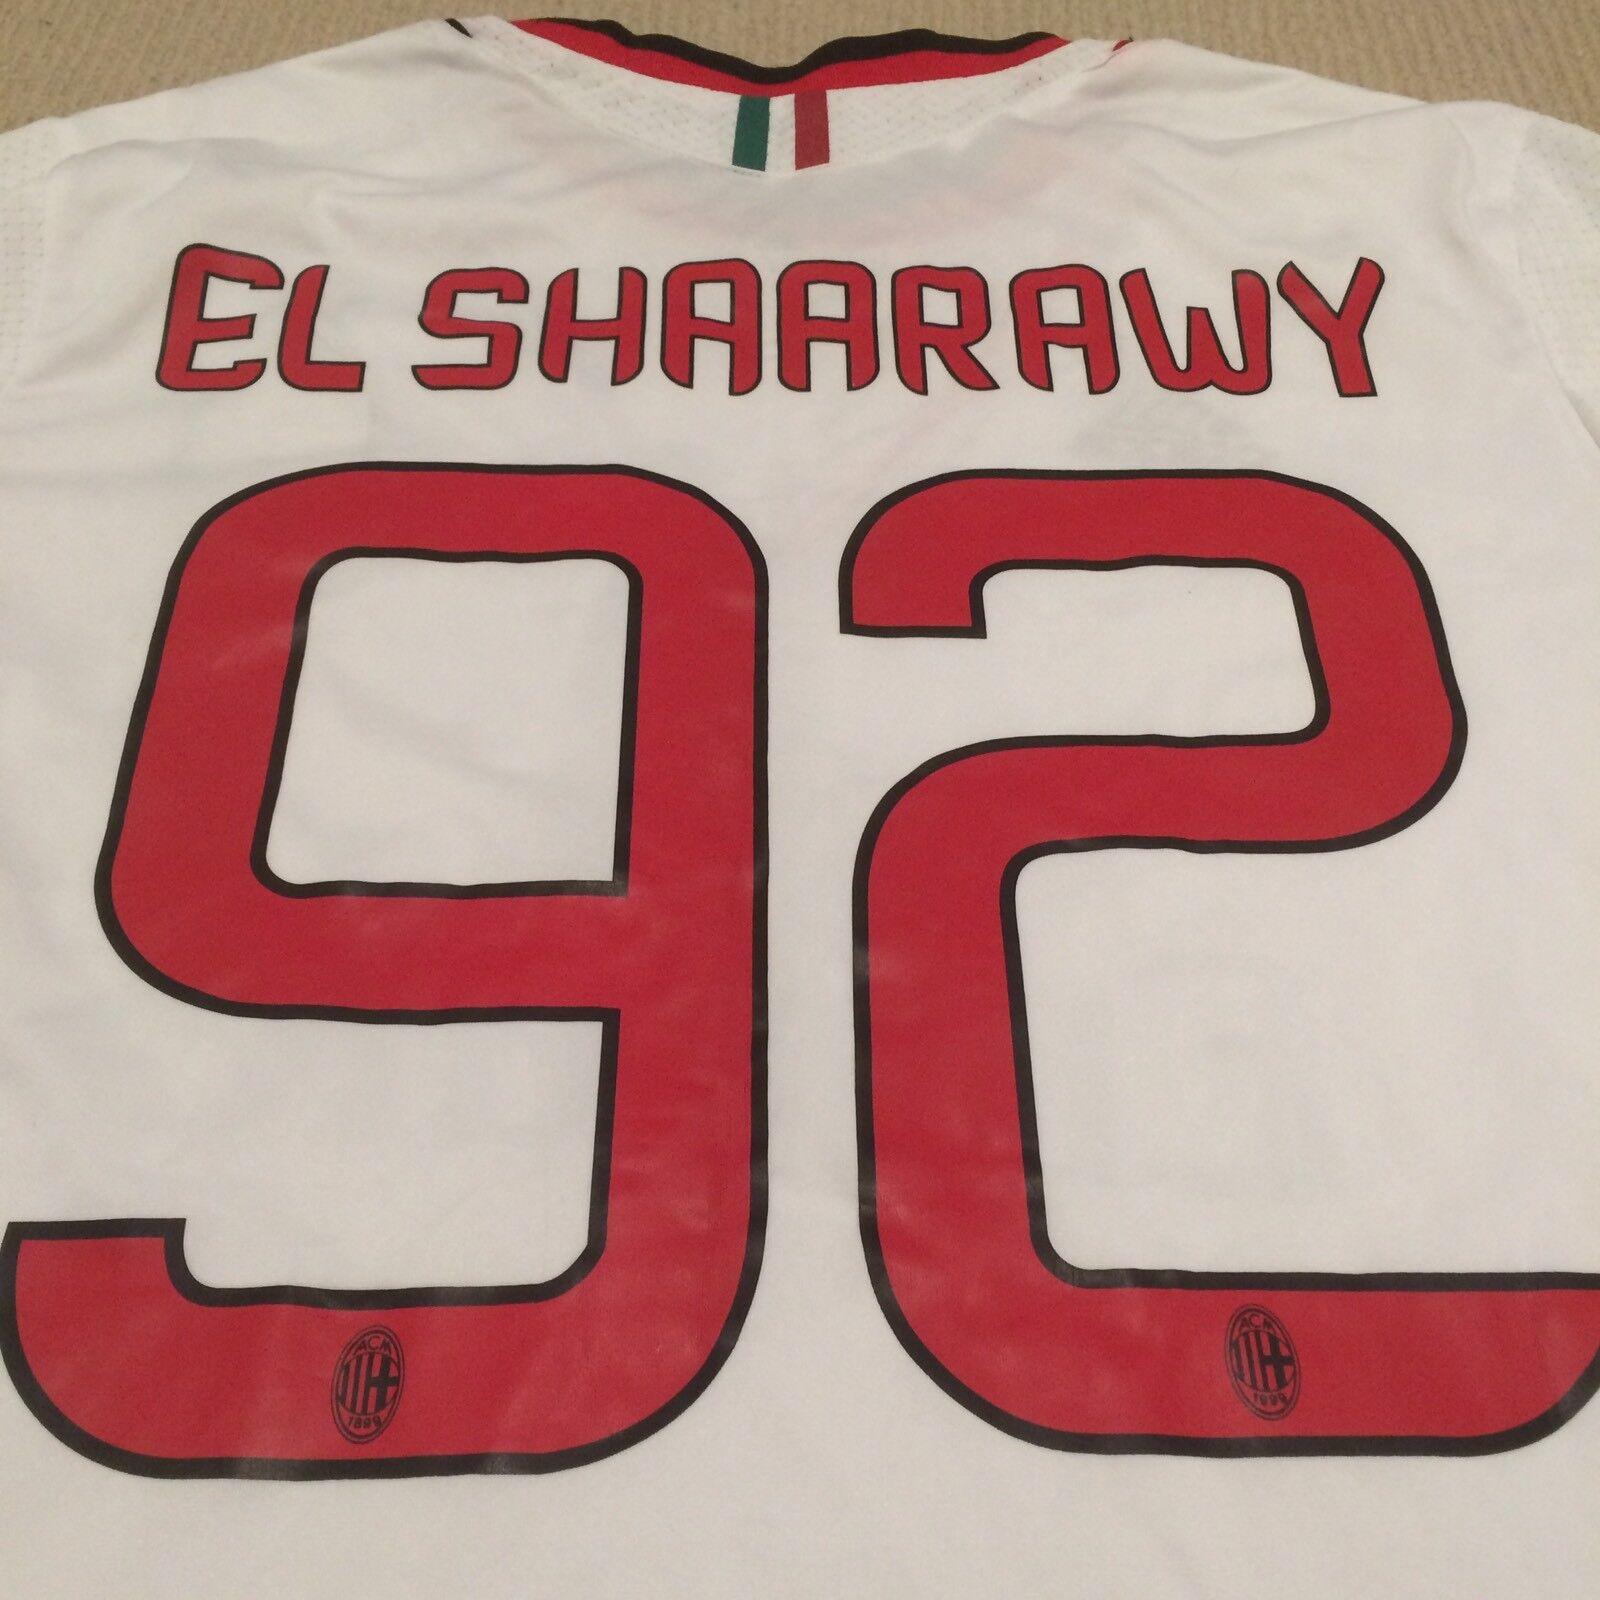 AC Milan EL Shaarawy adidas Away Jersey Shirt